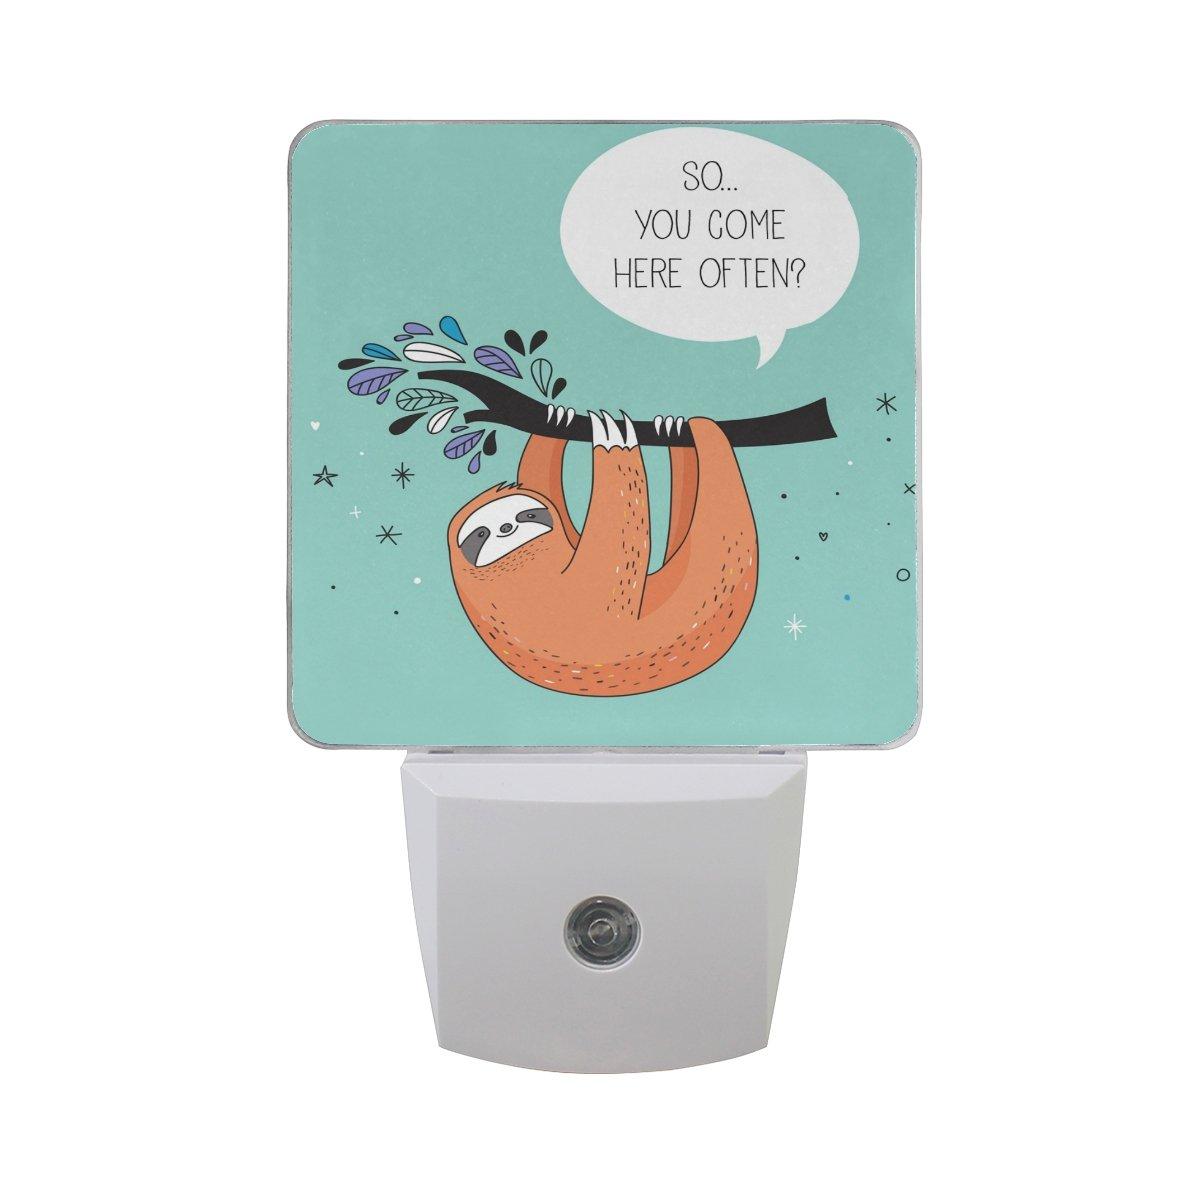 XinMing White Cartoon Sloth LED Sensor Night Light Super Bright Power Dusk To Dawn Sensor Bedroom Kitchen Bathroom Hallway Toilet Stairs Energy Efficient Compact(2 PACK)